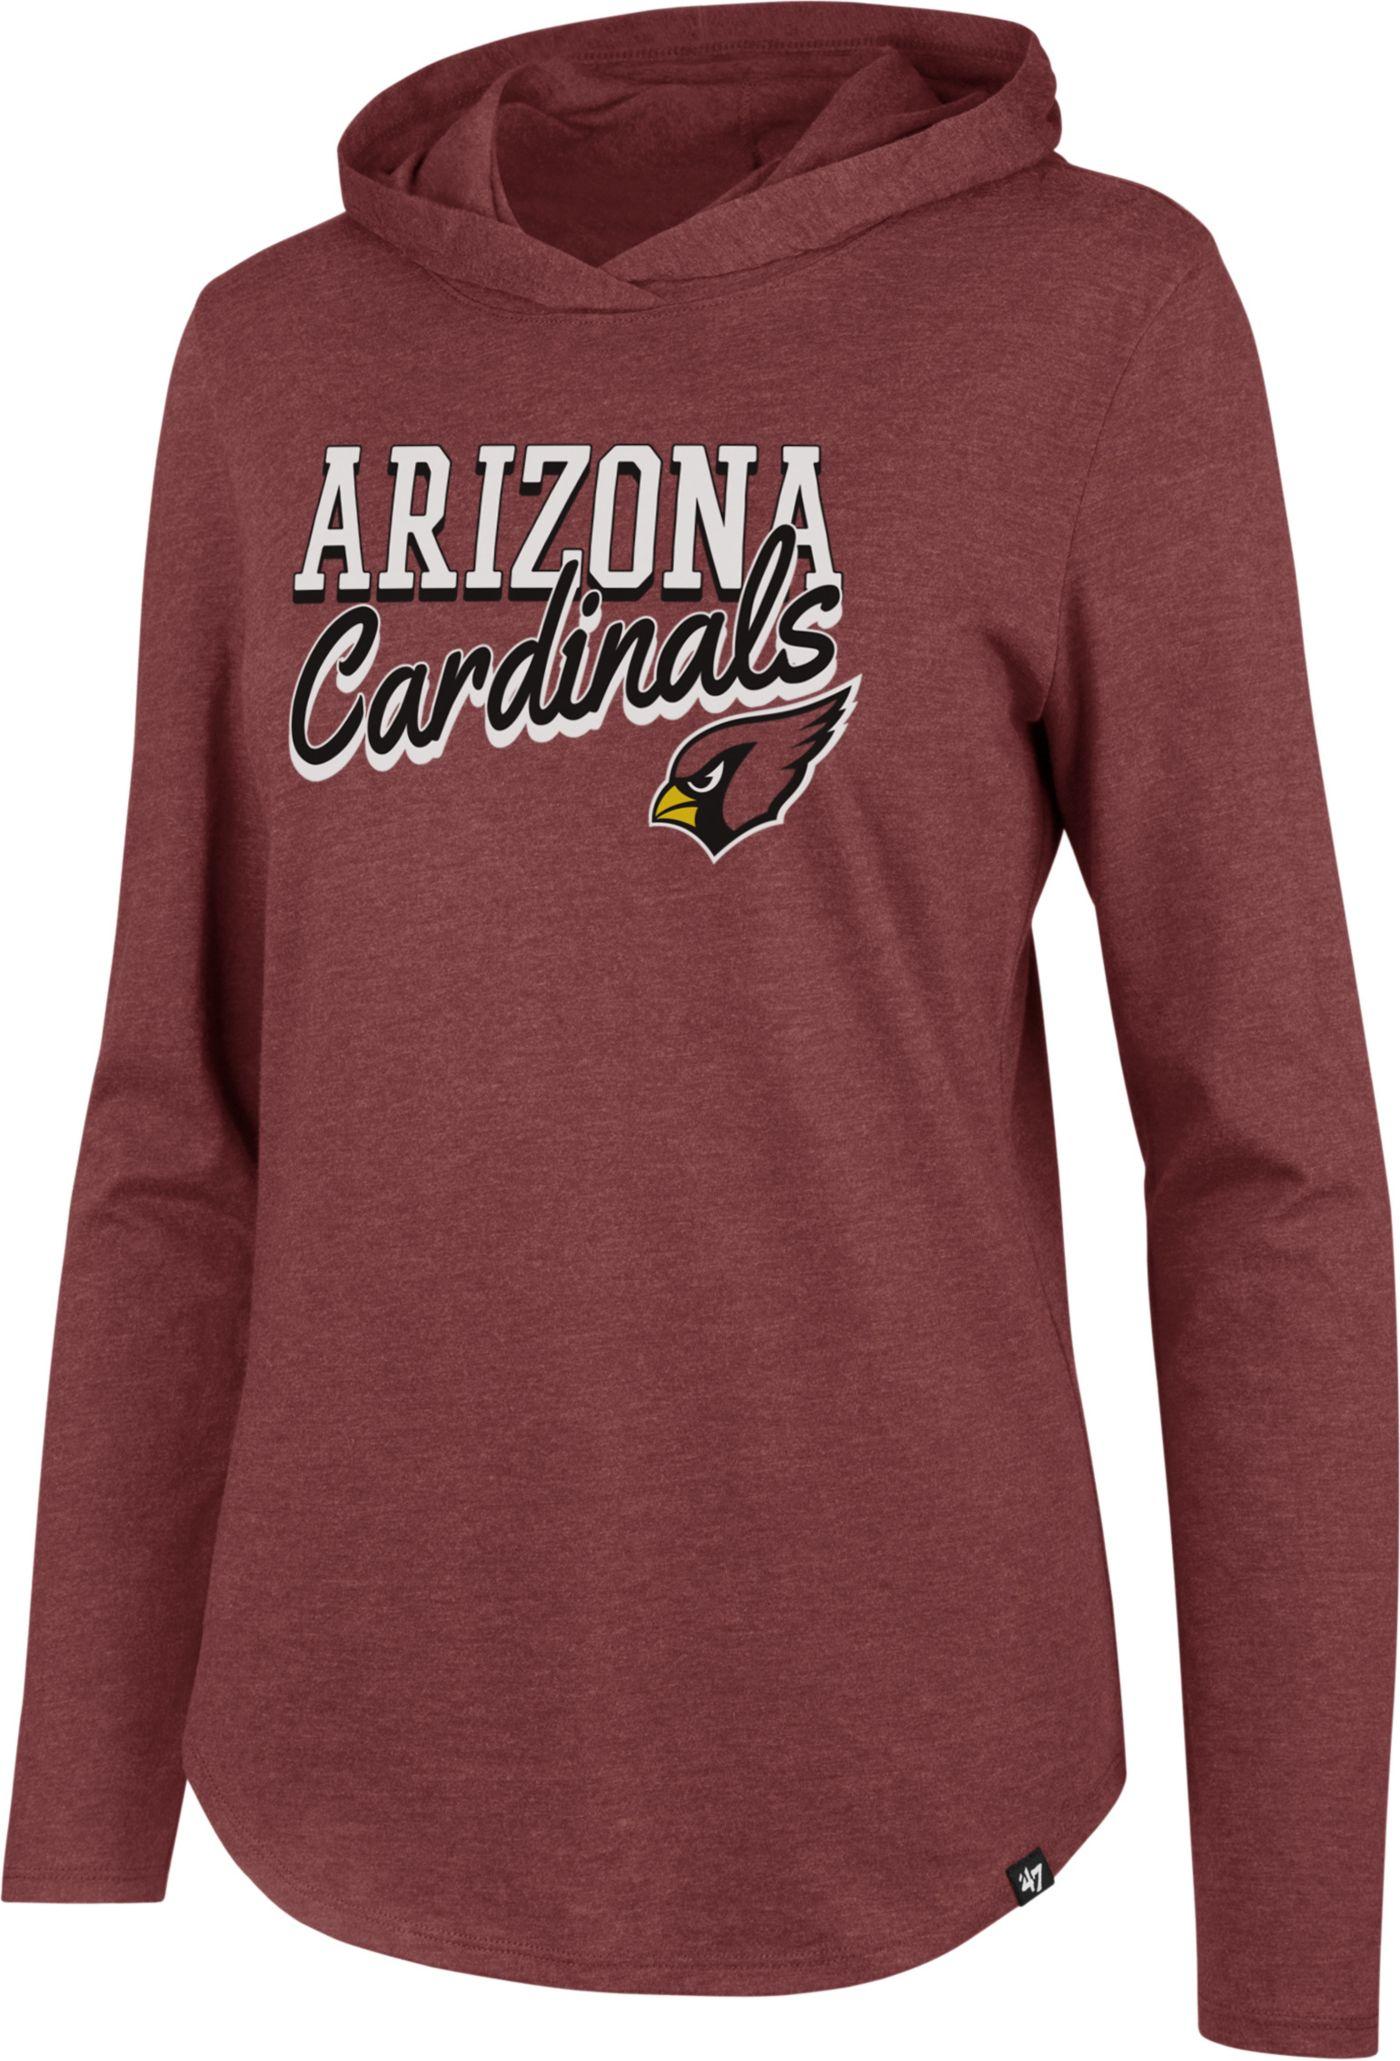 '47 Women's Arizona Cardinals Club Red Hooded Long Sleeve Shirt